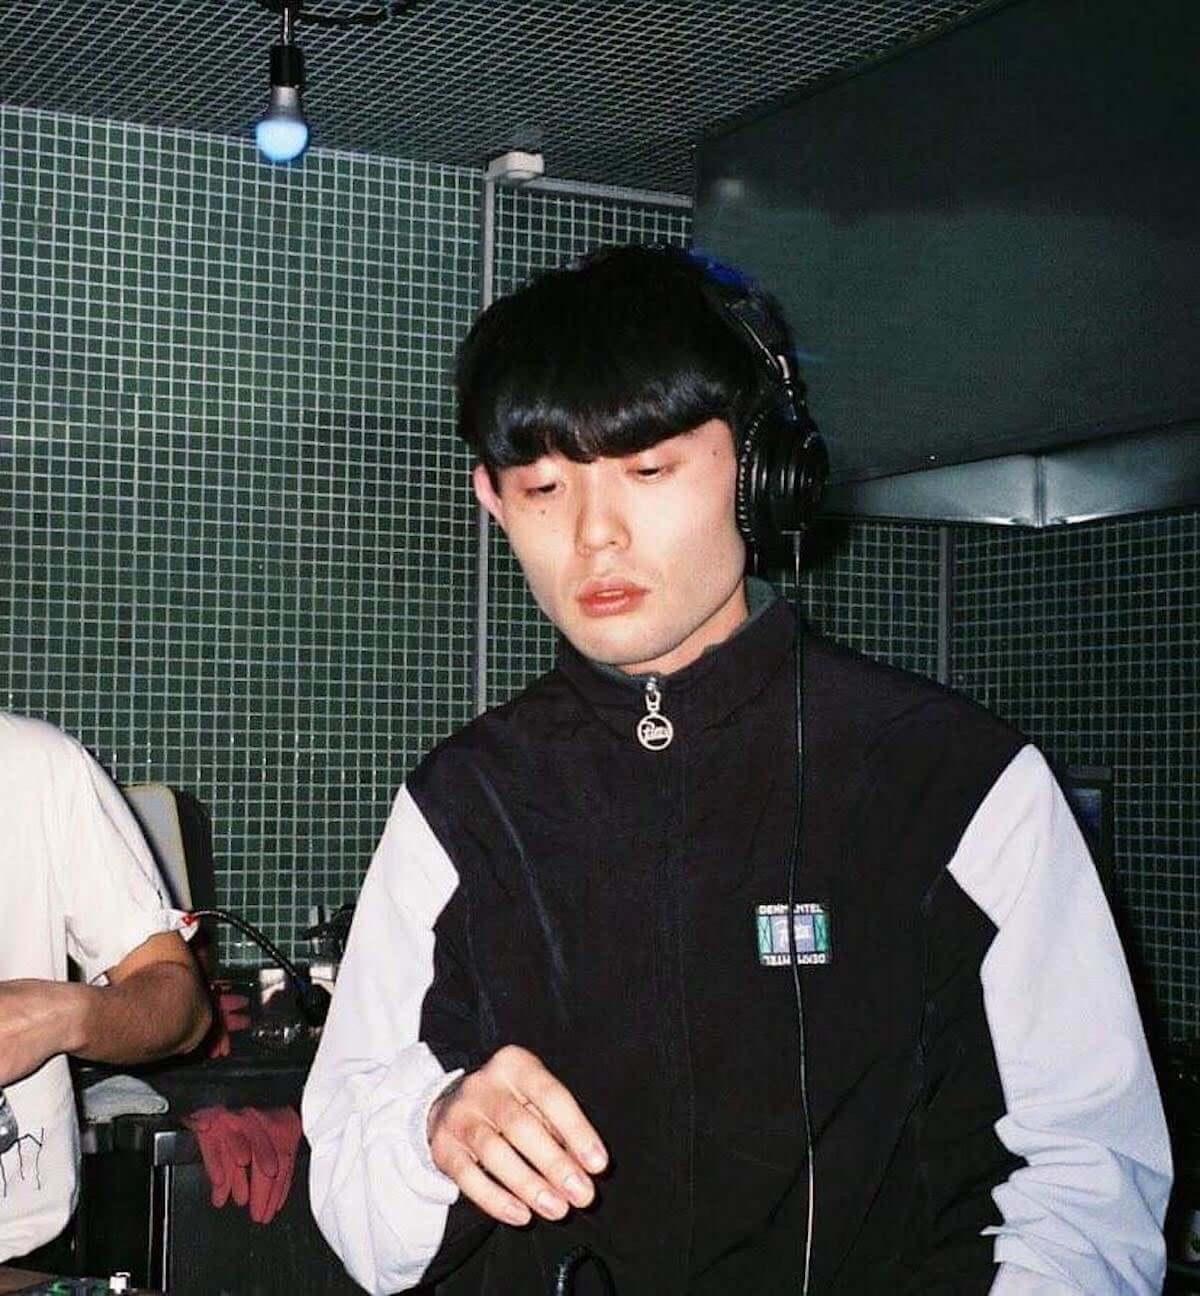 STUDIO VOICEとWWWのレギュラー企画「In&Out」と「上東」の共同イベントが開催 4-KOTSU-1200x1296